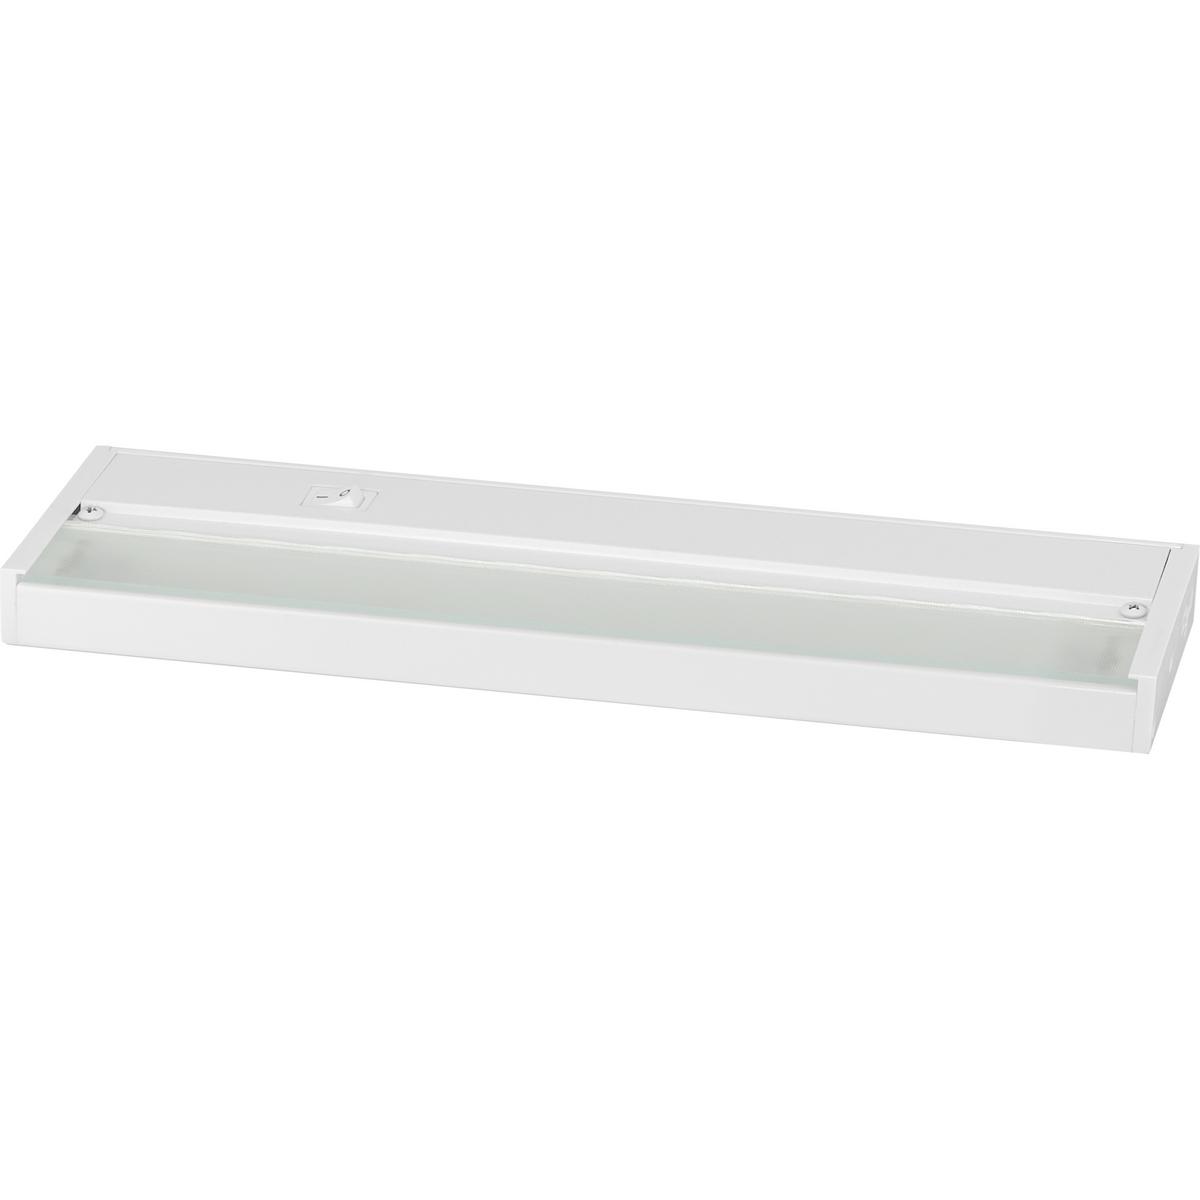 PRO P7012-30 LED Undercabinet 12